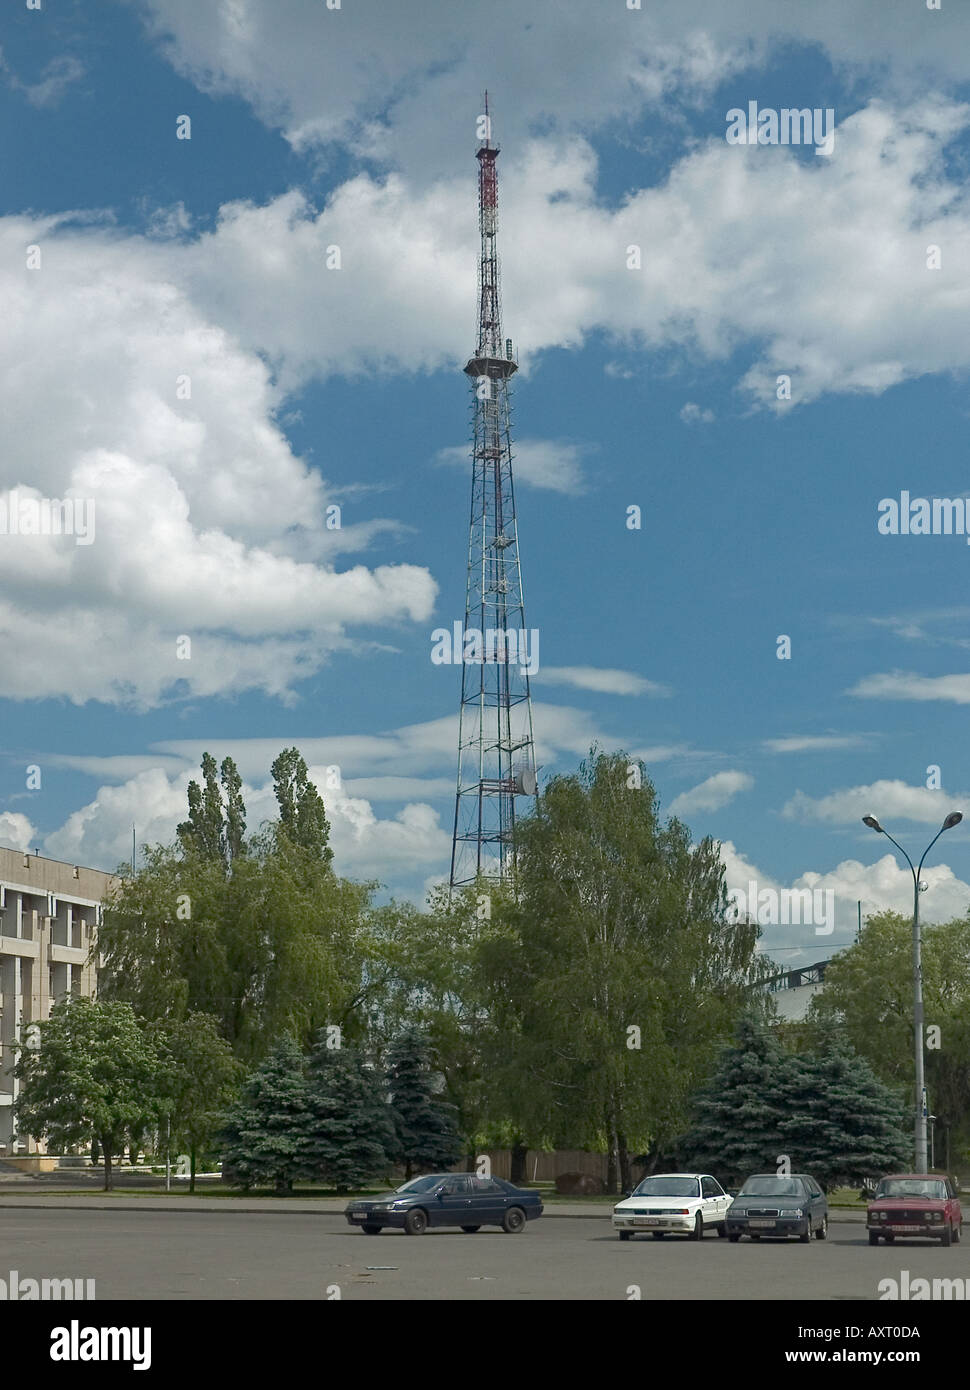 Gomel FM radio, broadcasting station and transmission aerial